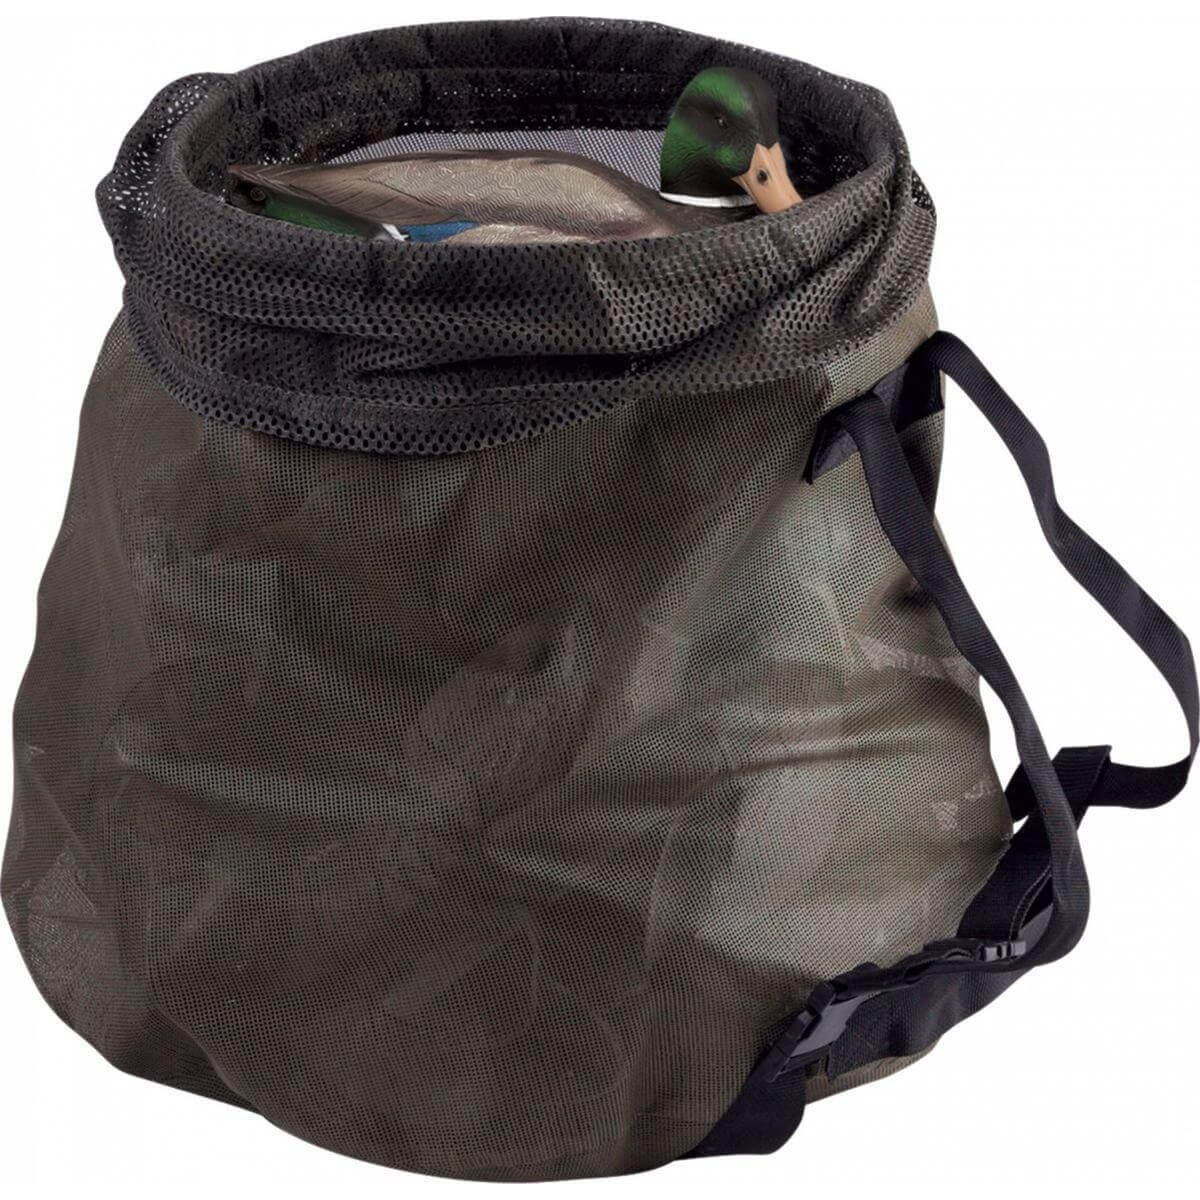 Drake Big Mouth Decoy Bag with Pyramid Bottom